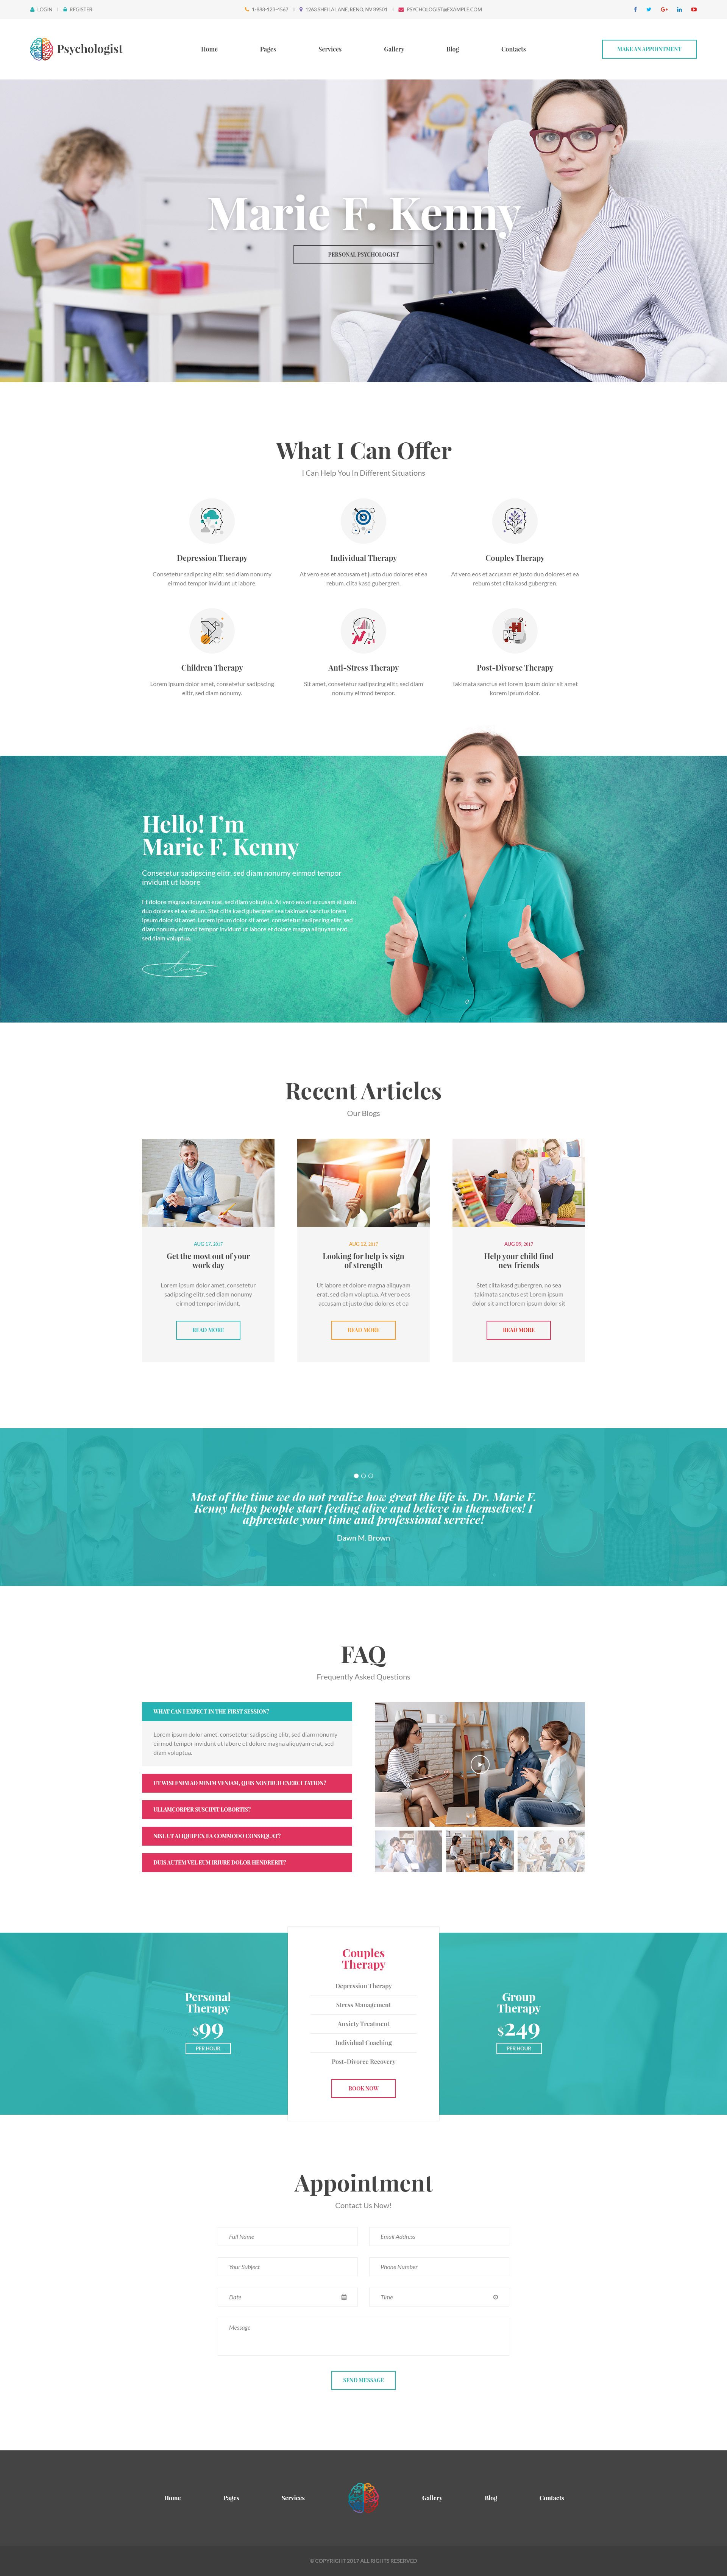 Pin By Mayursutariya93 On Ui Design Psd Templates Web Design Inspiration Website Template